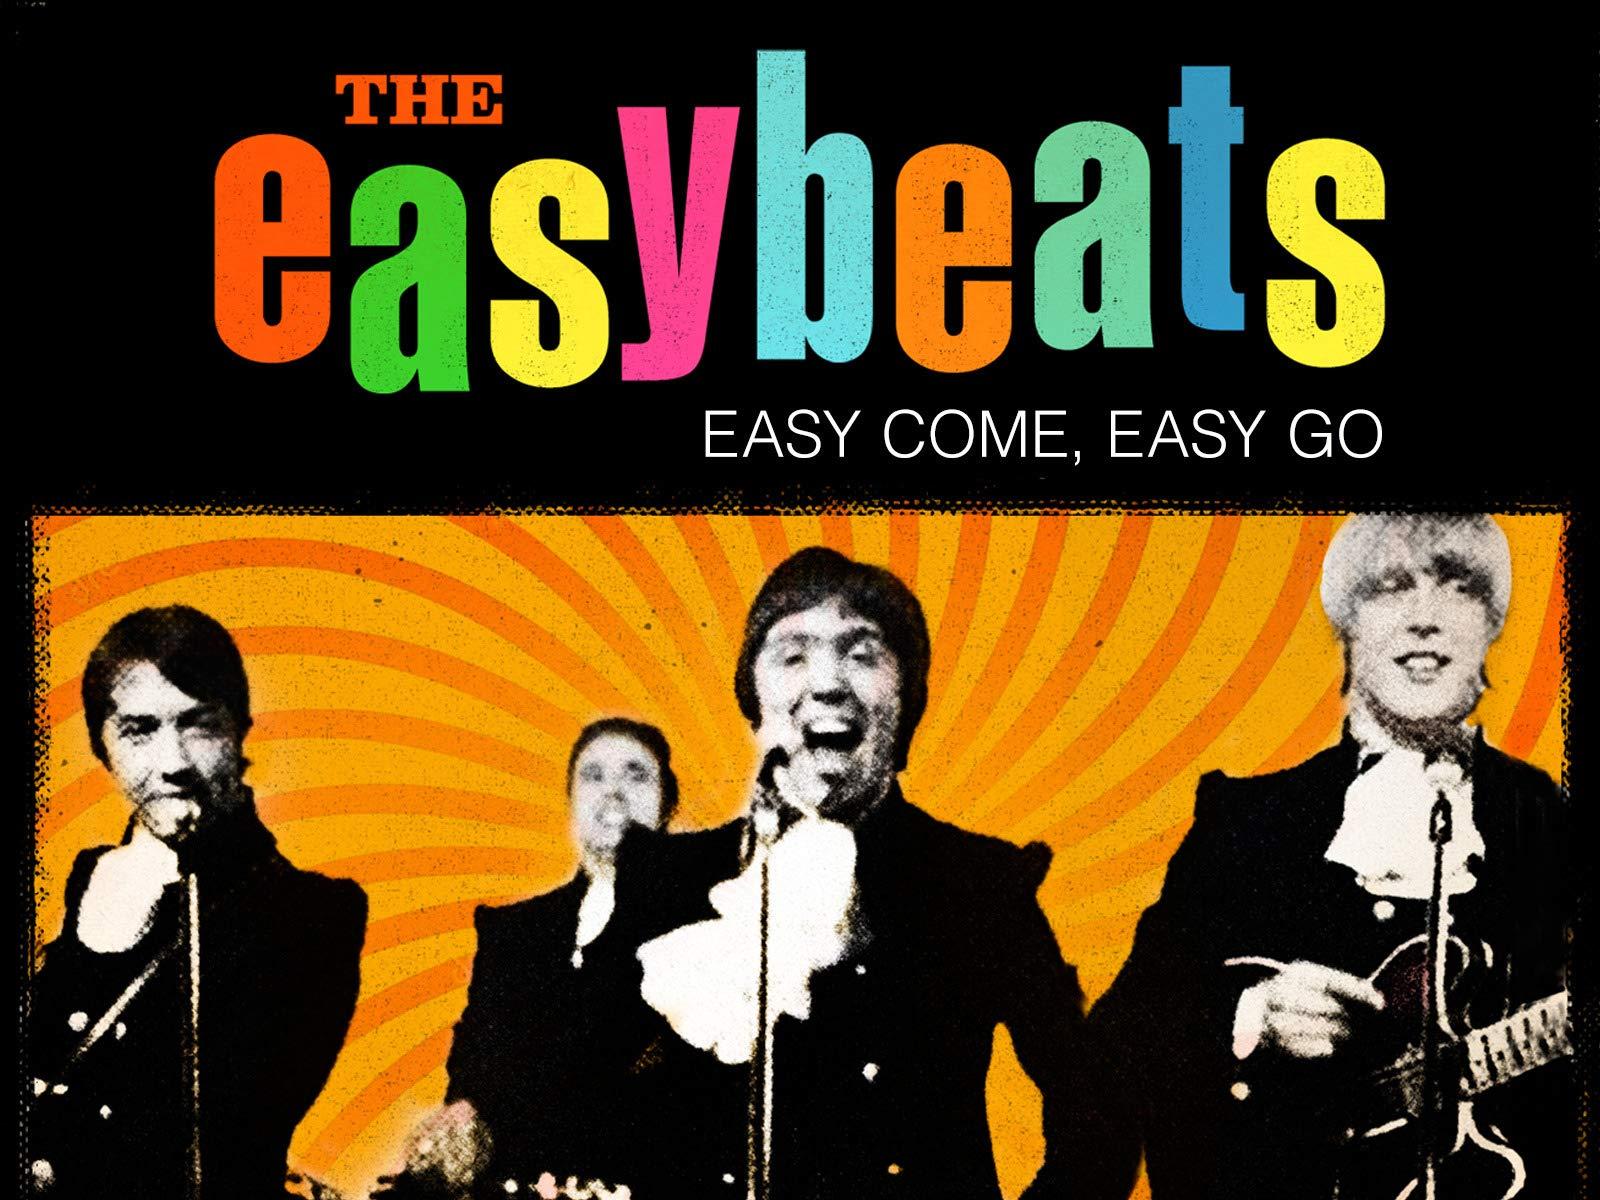 The Easybeats: Easy Come, Easy Go - Season 1